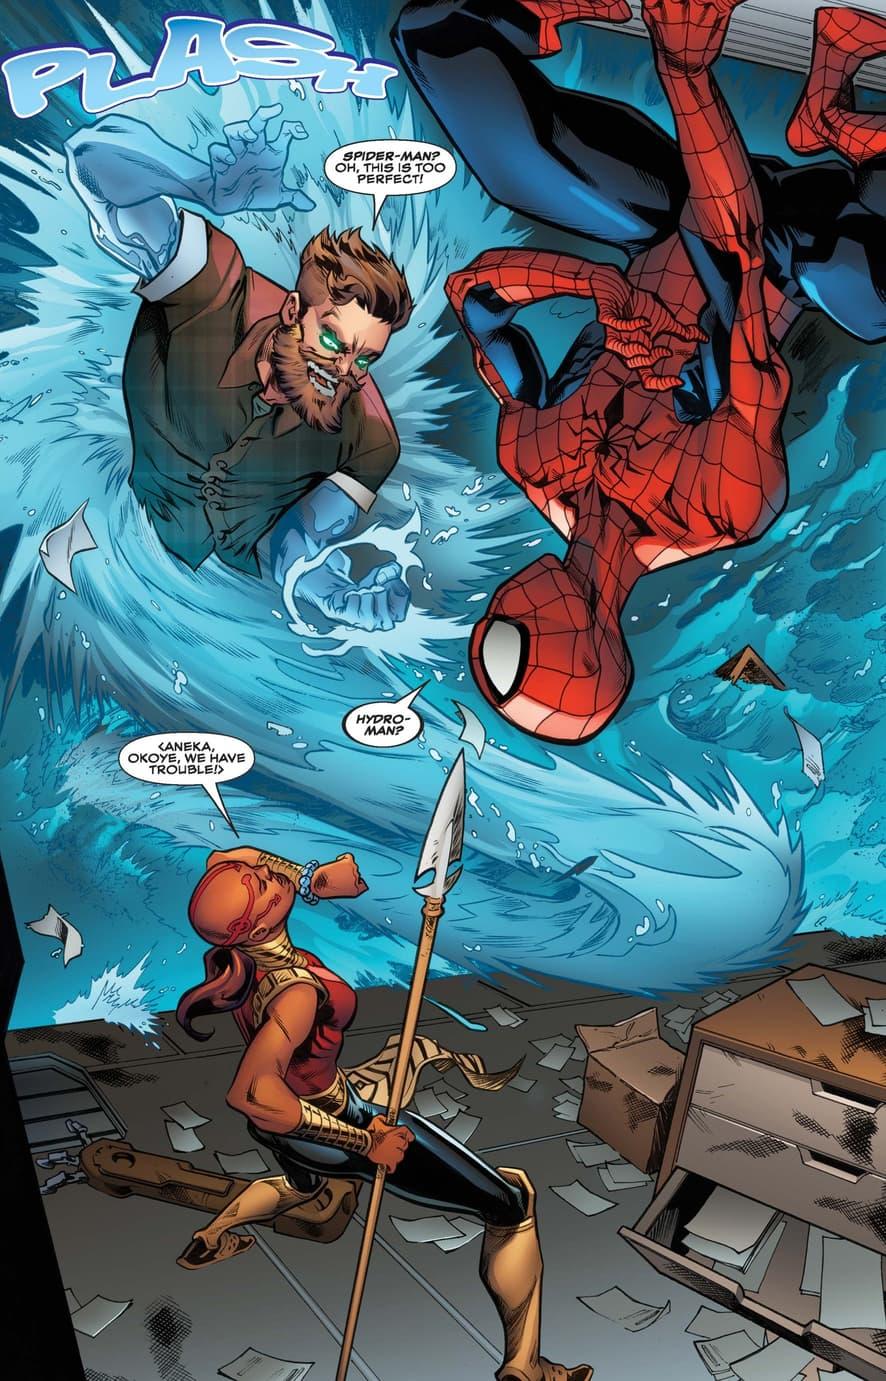 Ayo saves the day in AMAZING SPIDER-MAN: WAKANDA FOREVER (2018) #1.